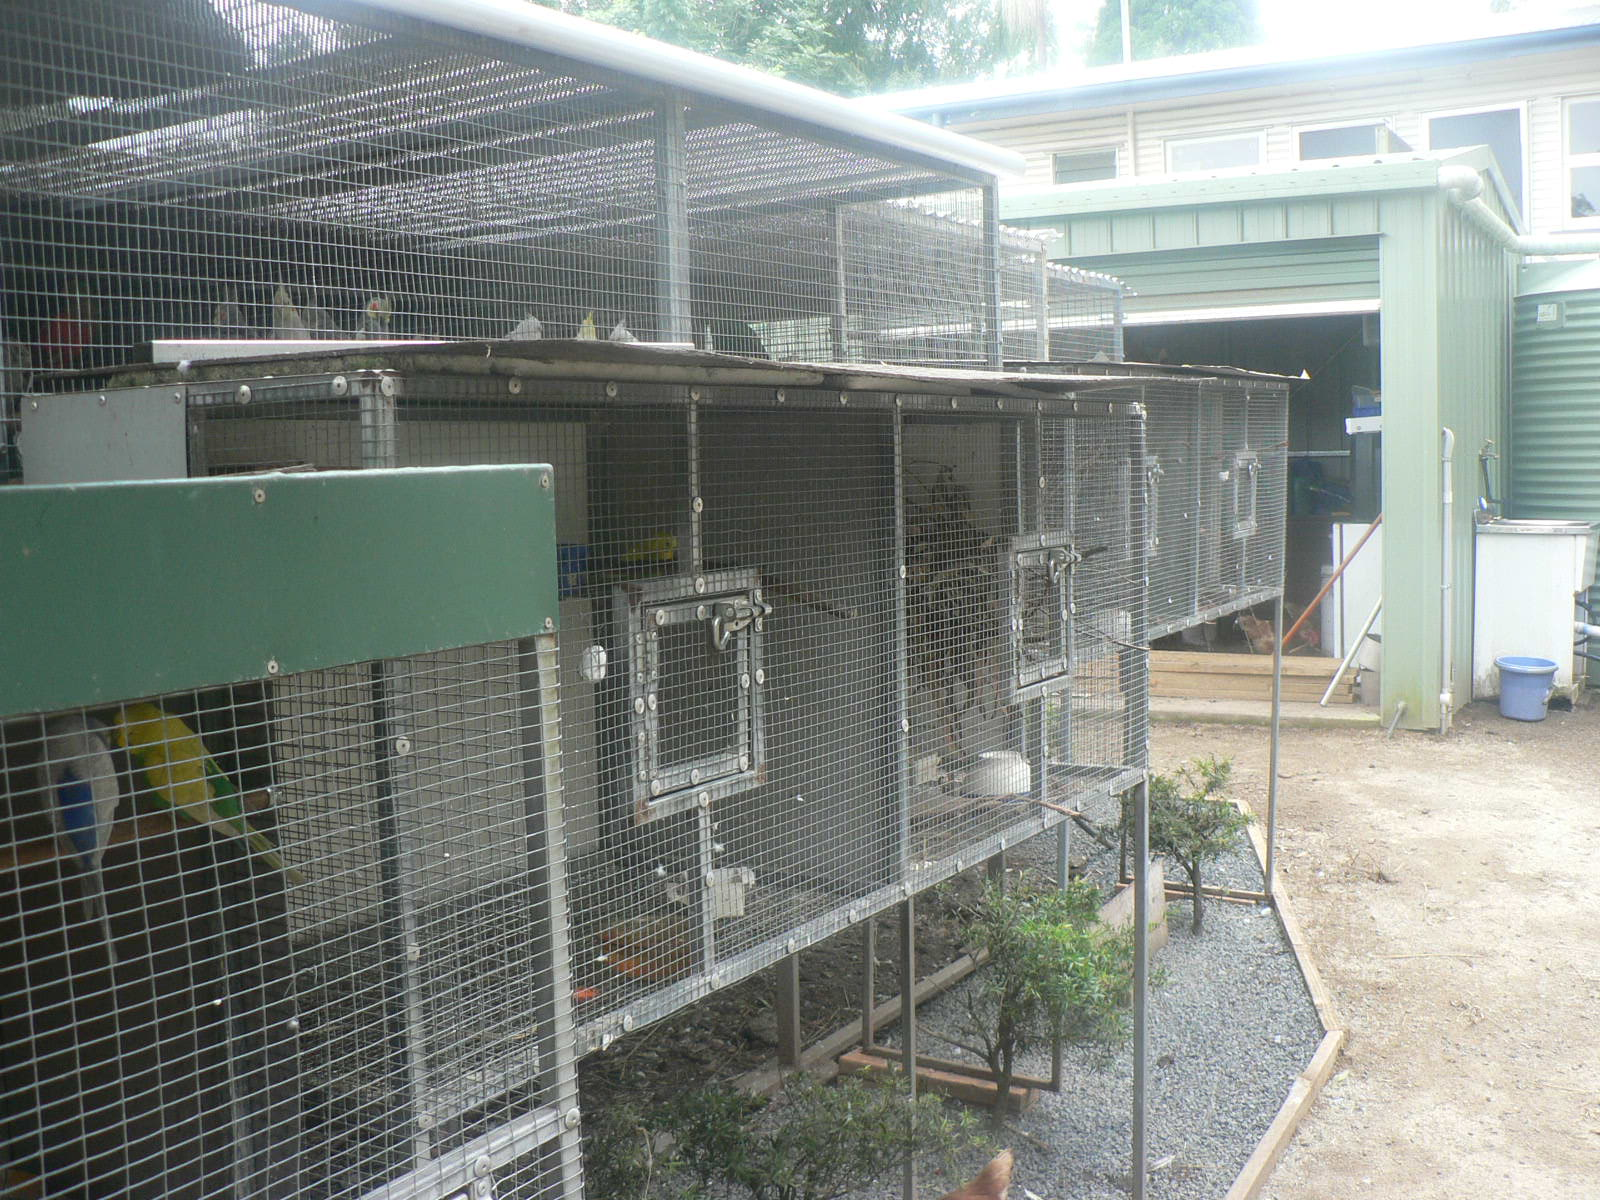 Heyden birds: My aviaries and setup